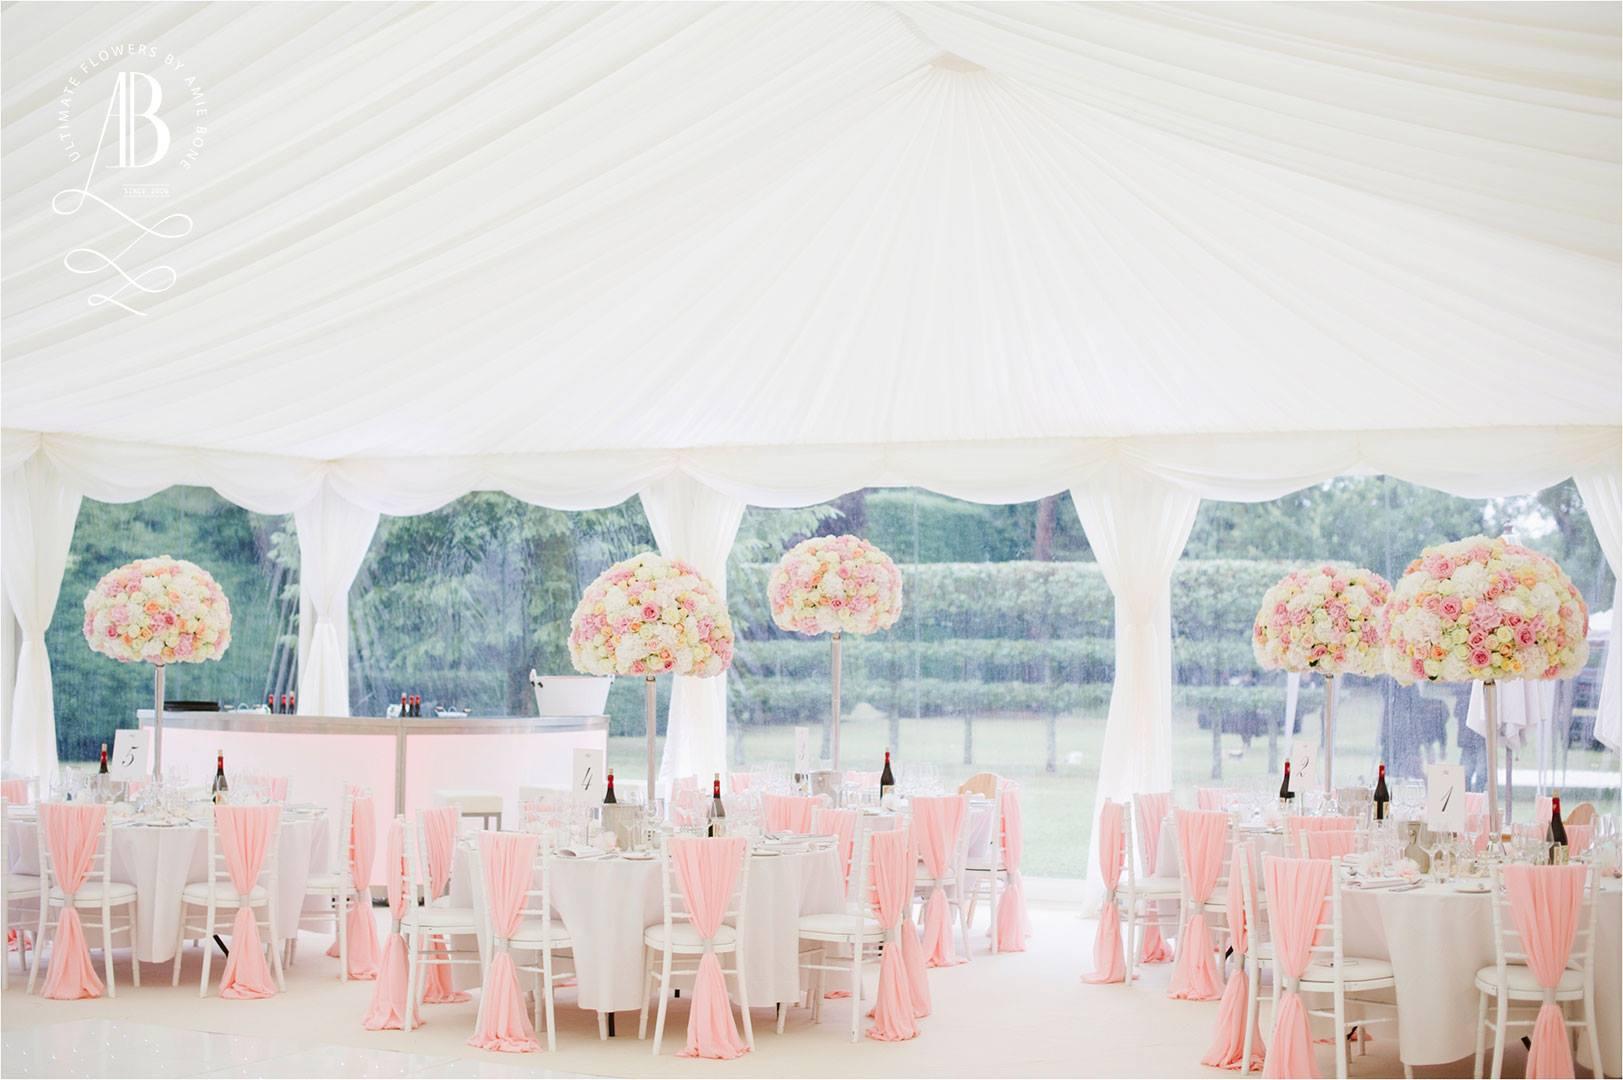 Sorbet heaven - wedding decor by Amie Bone Flowers